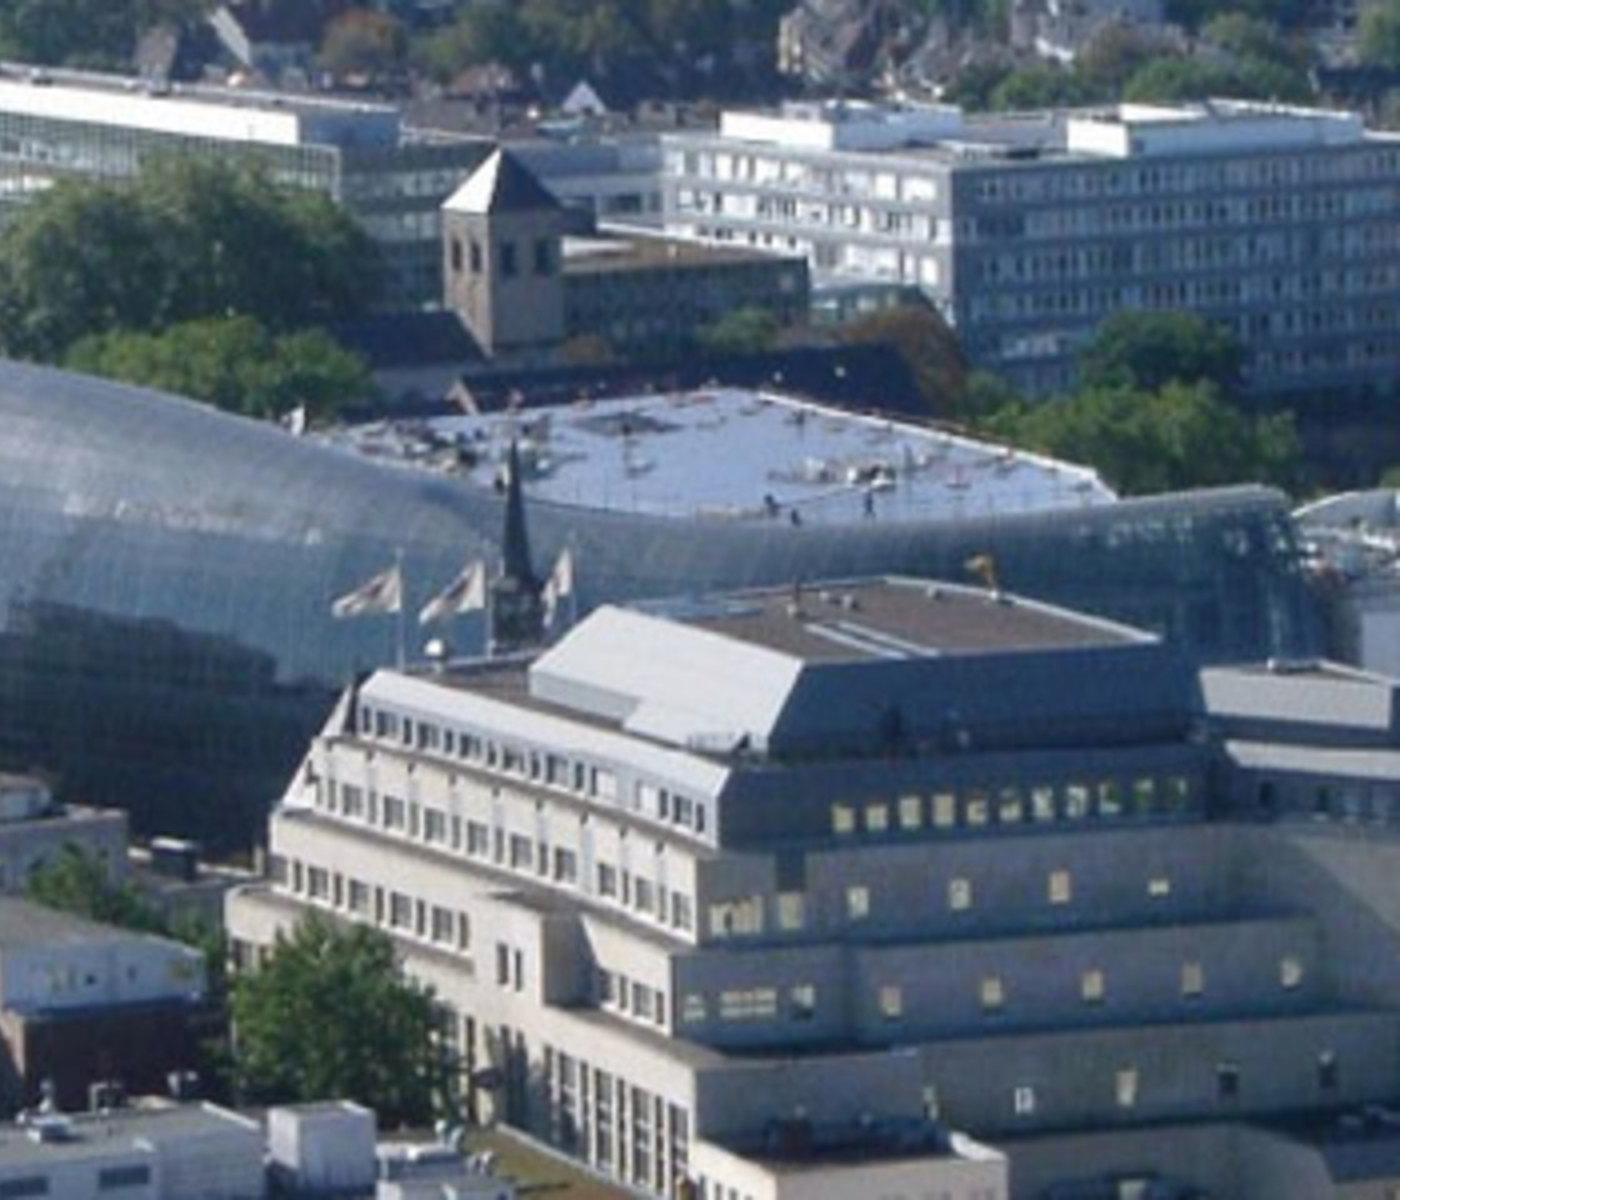 Peek & Cloppenburg. Cologne. Renzo Piano. 2005